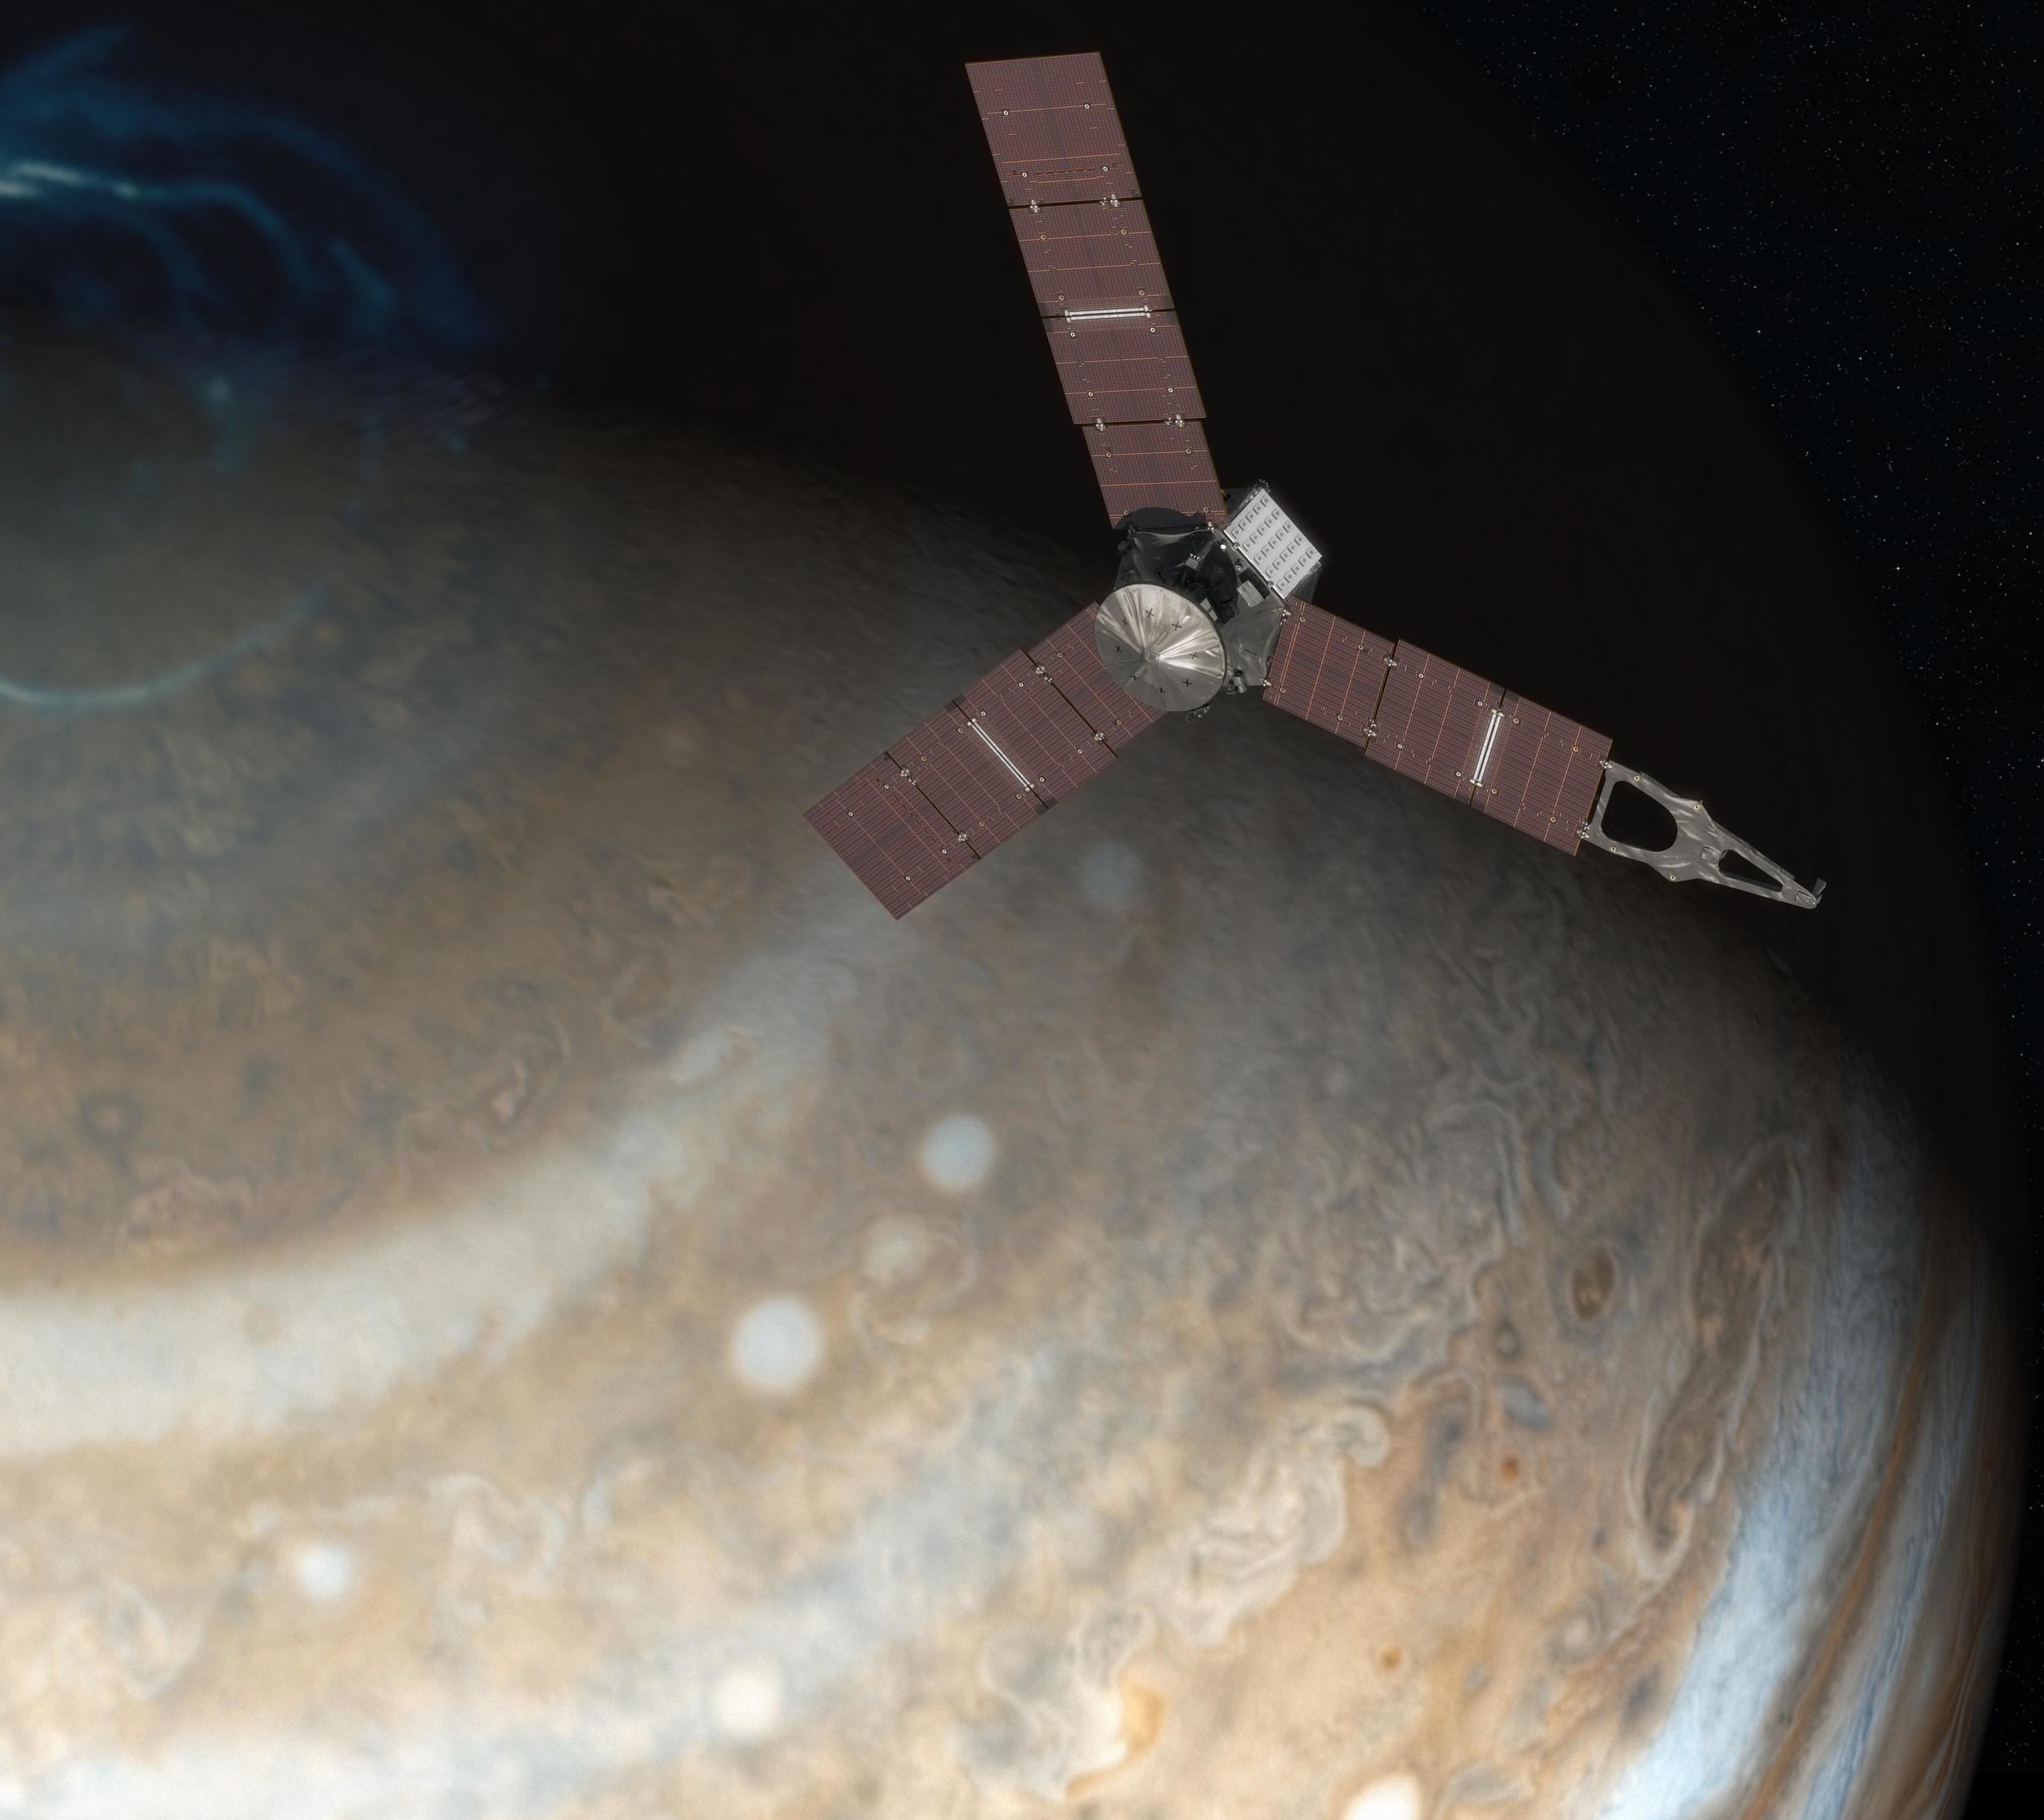 An artist's impression of Juno above Jupiter's pole. - Image Credit: NASA/JPL-Caltech